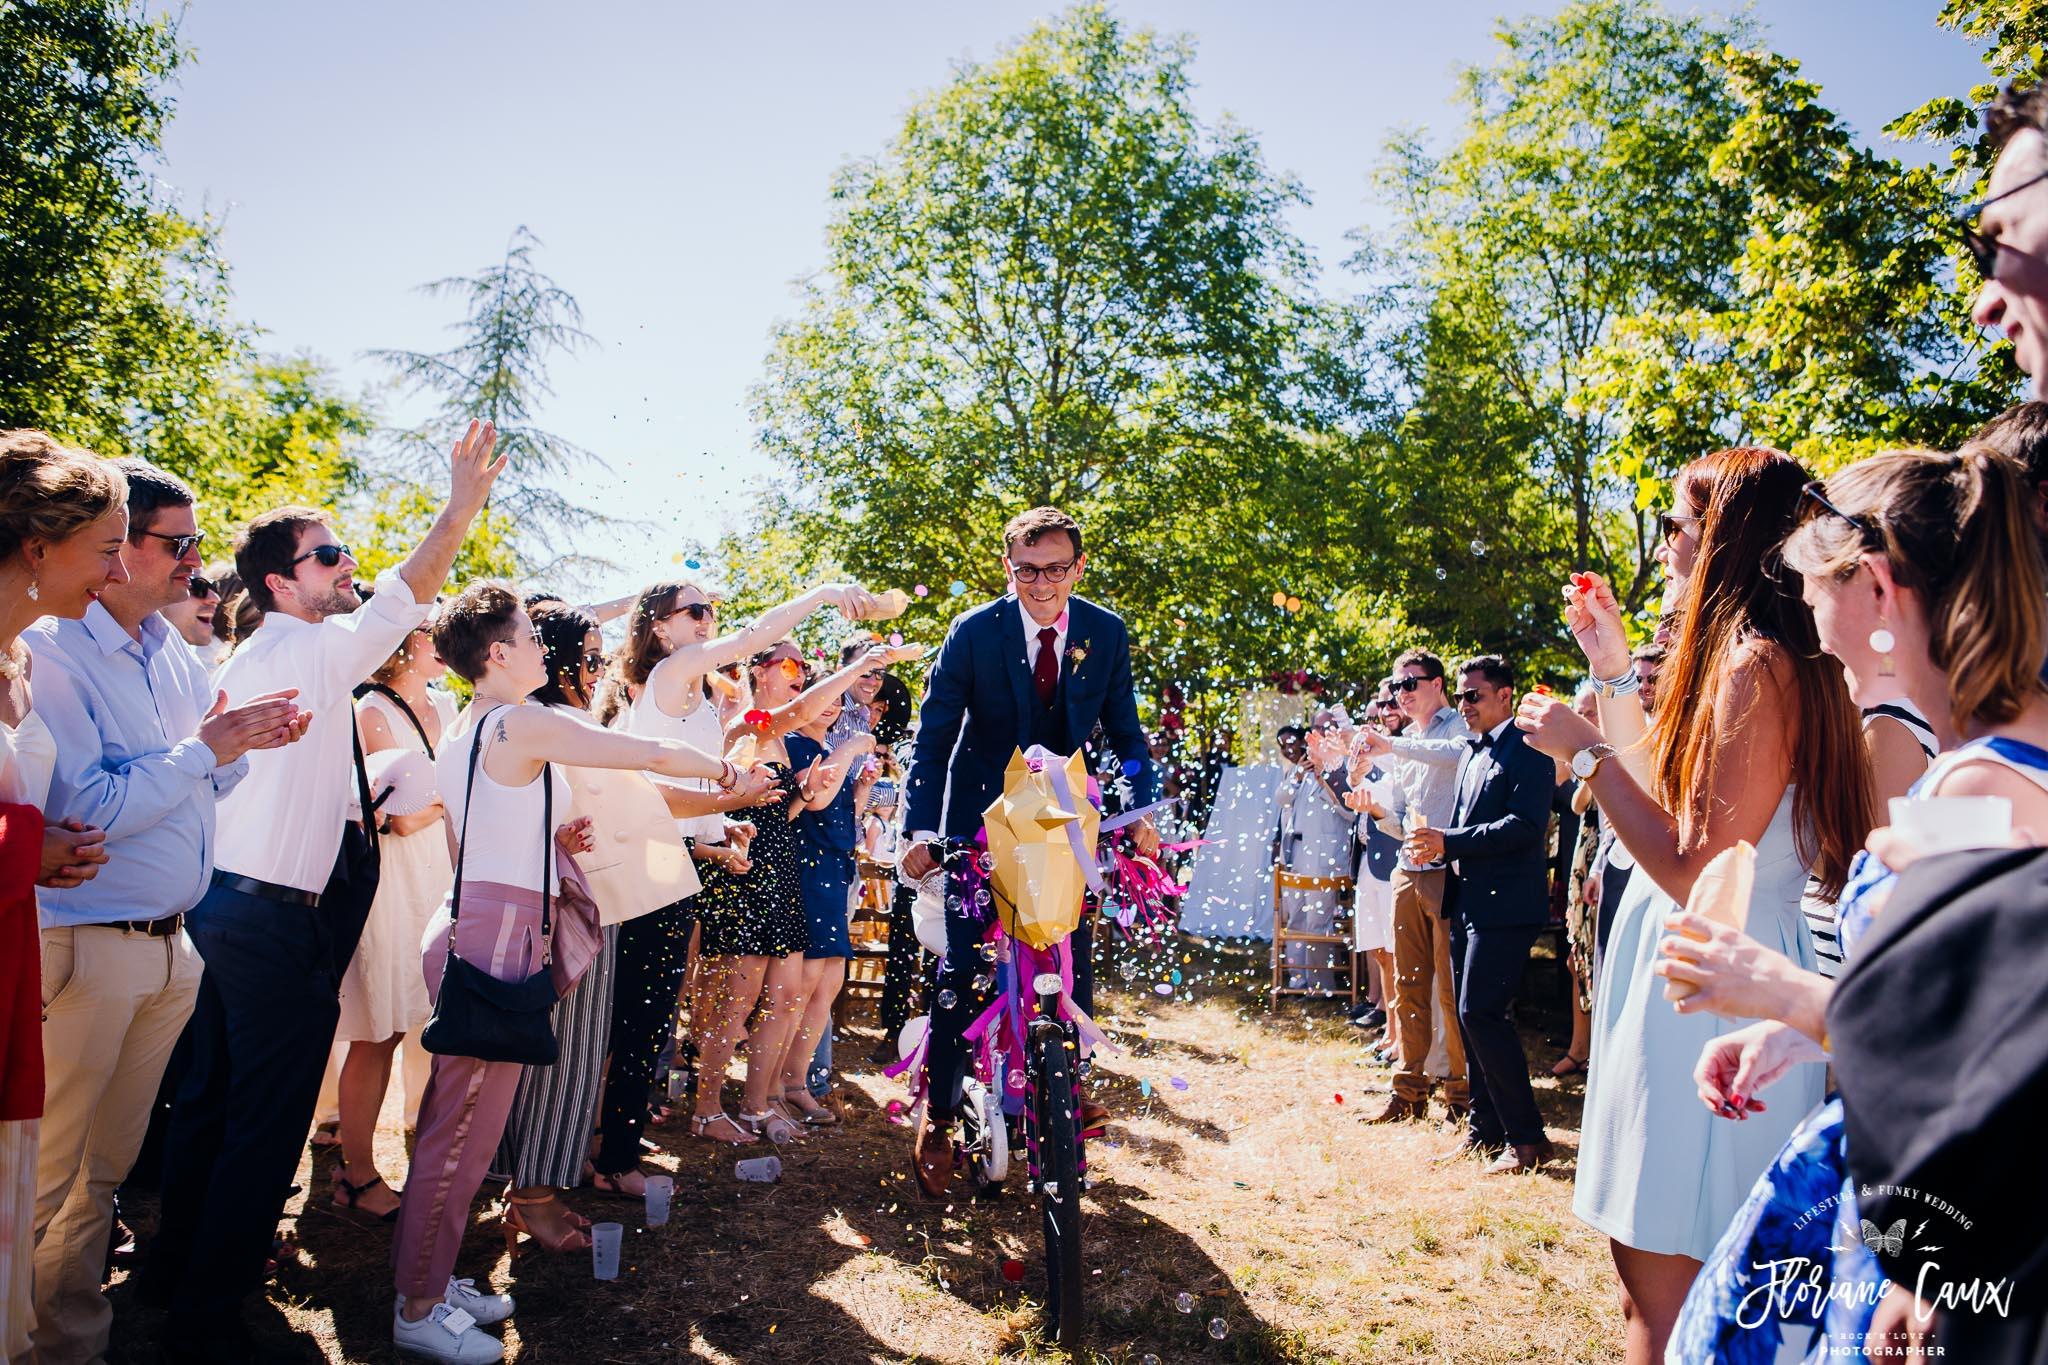 mariage-festival-cahors-ceremonie-laique-velo-licorne-9